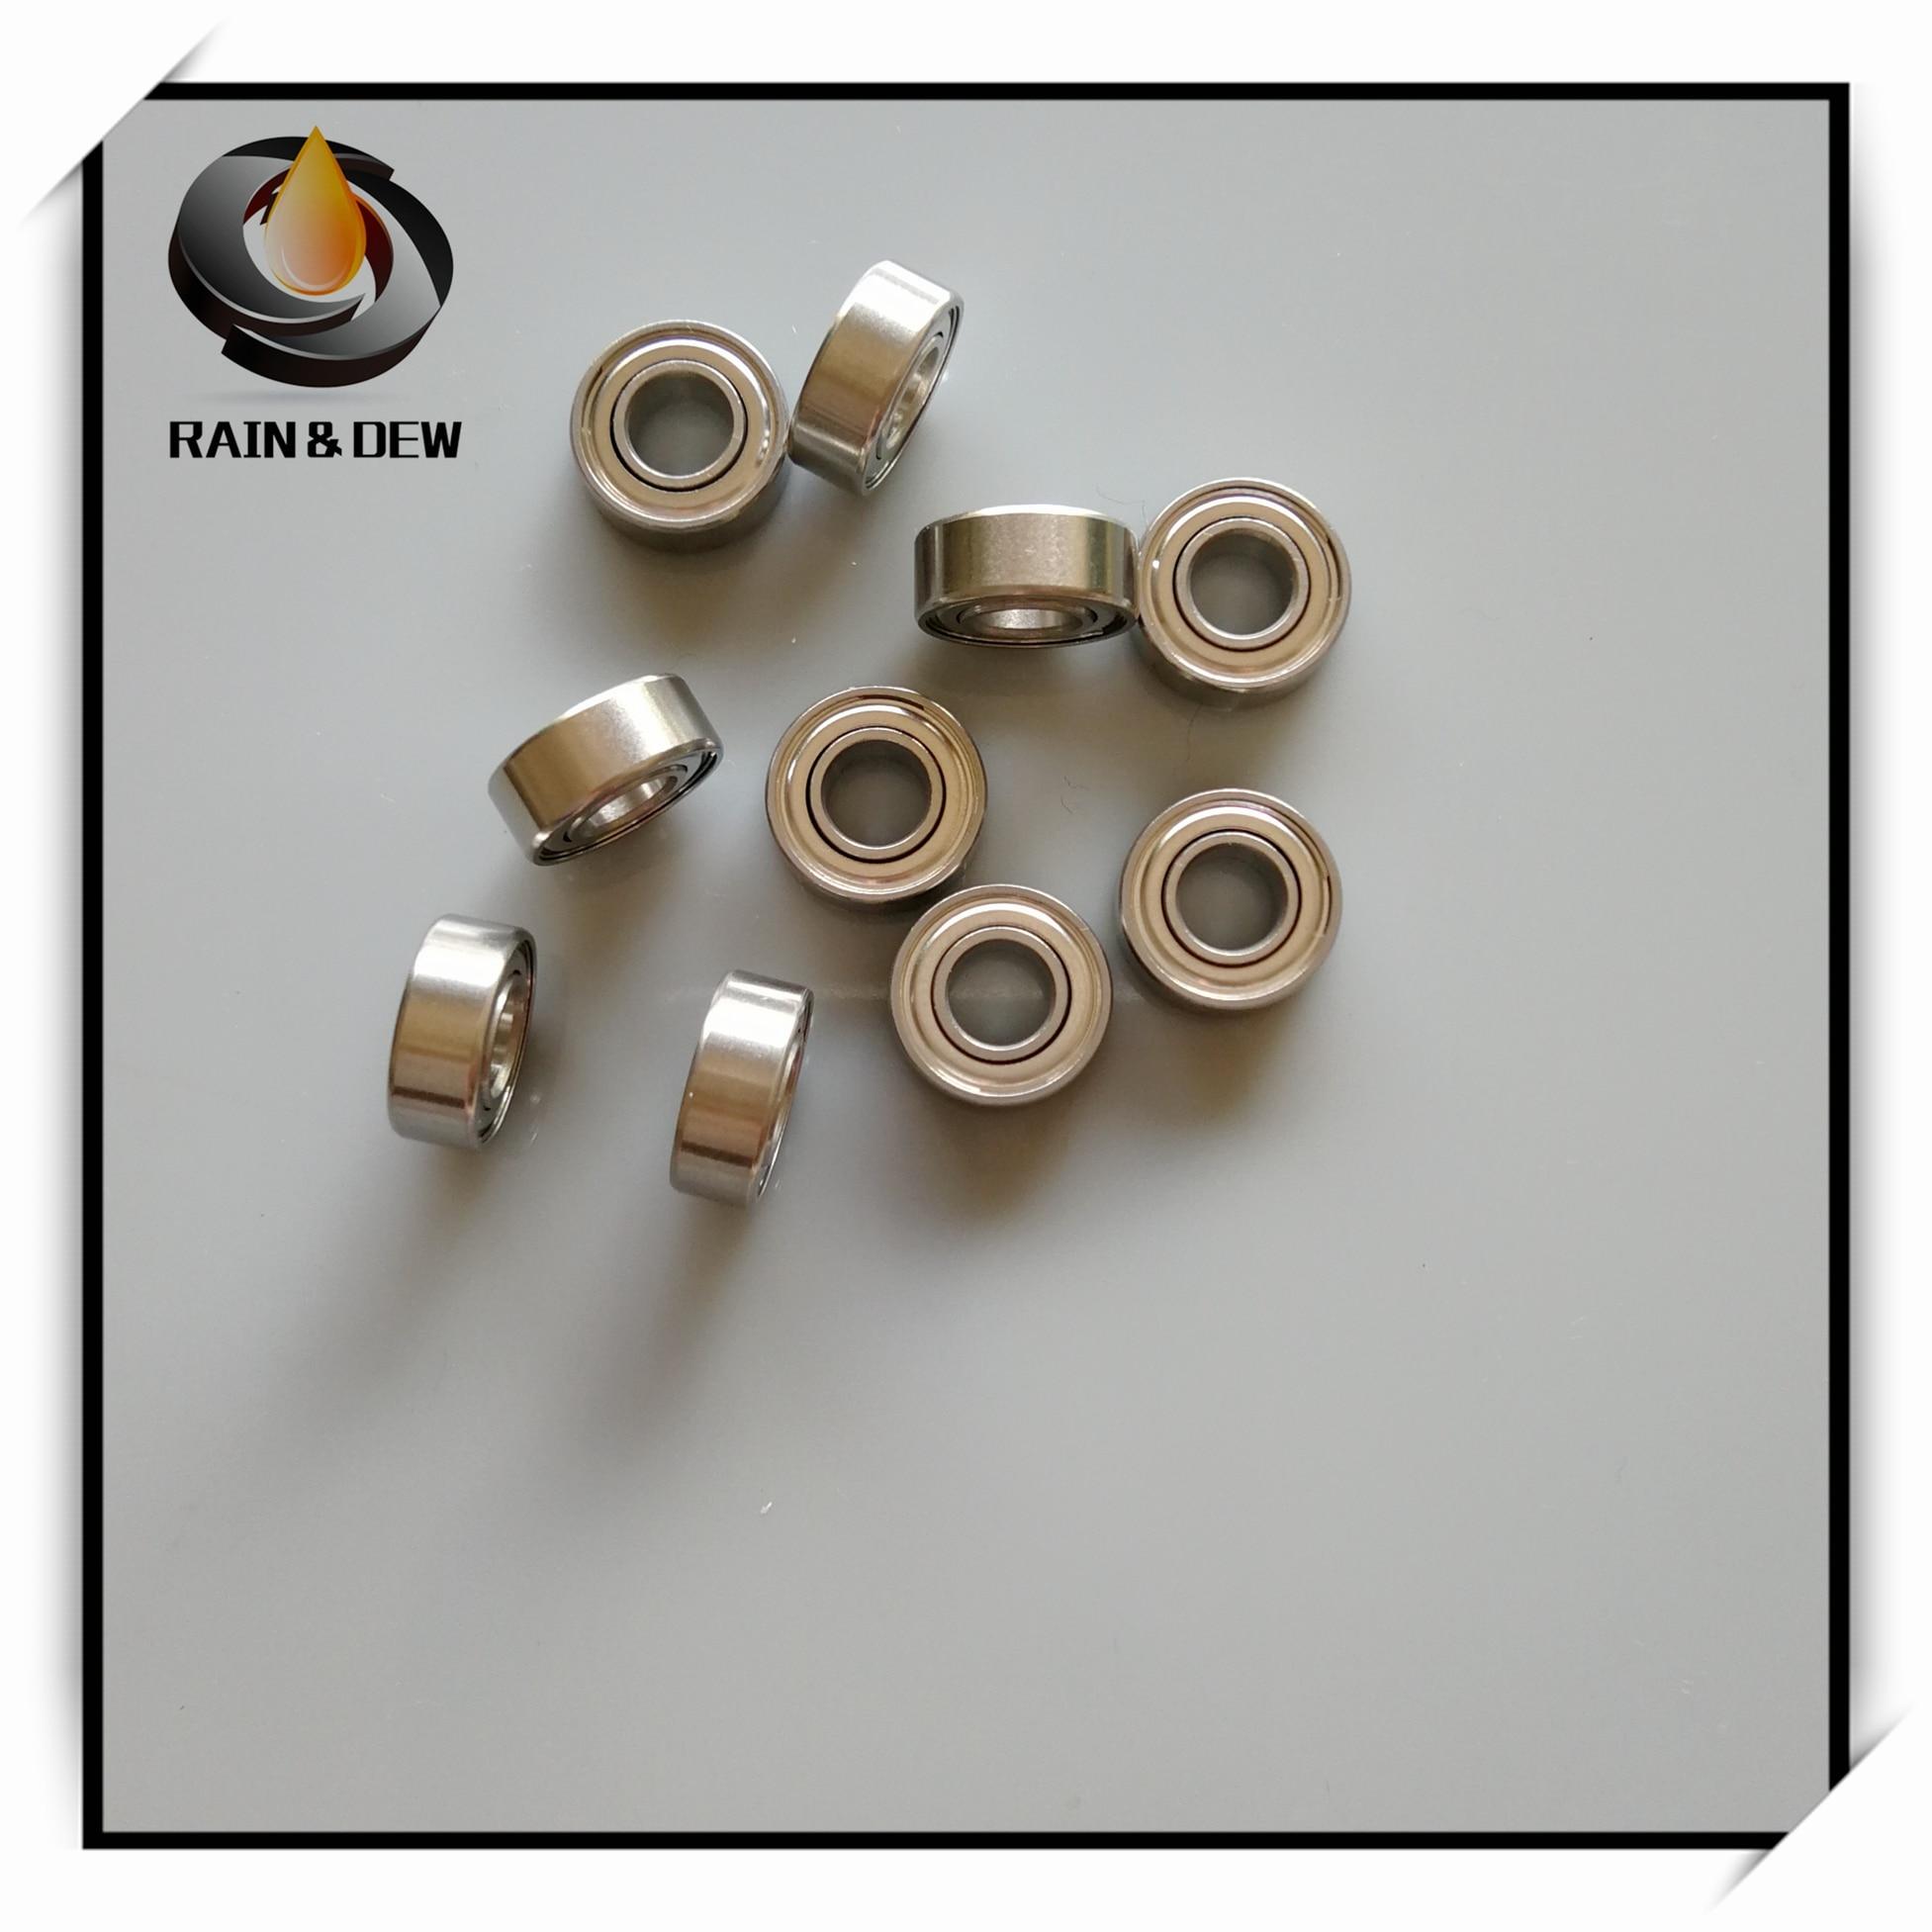 5pcs SMR126zz SMR126 6x12x4 mm Stainless Steel 440c Ball Bearing Bearings